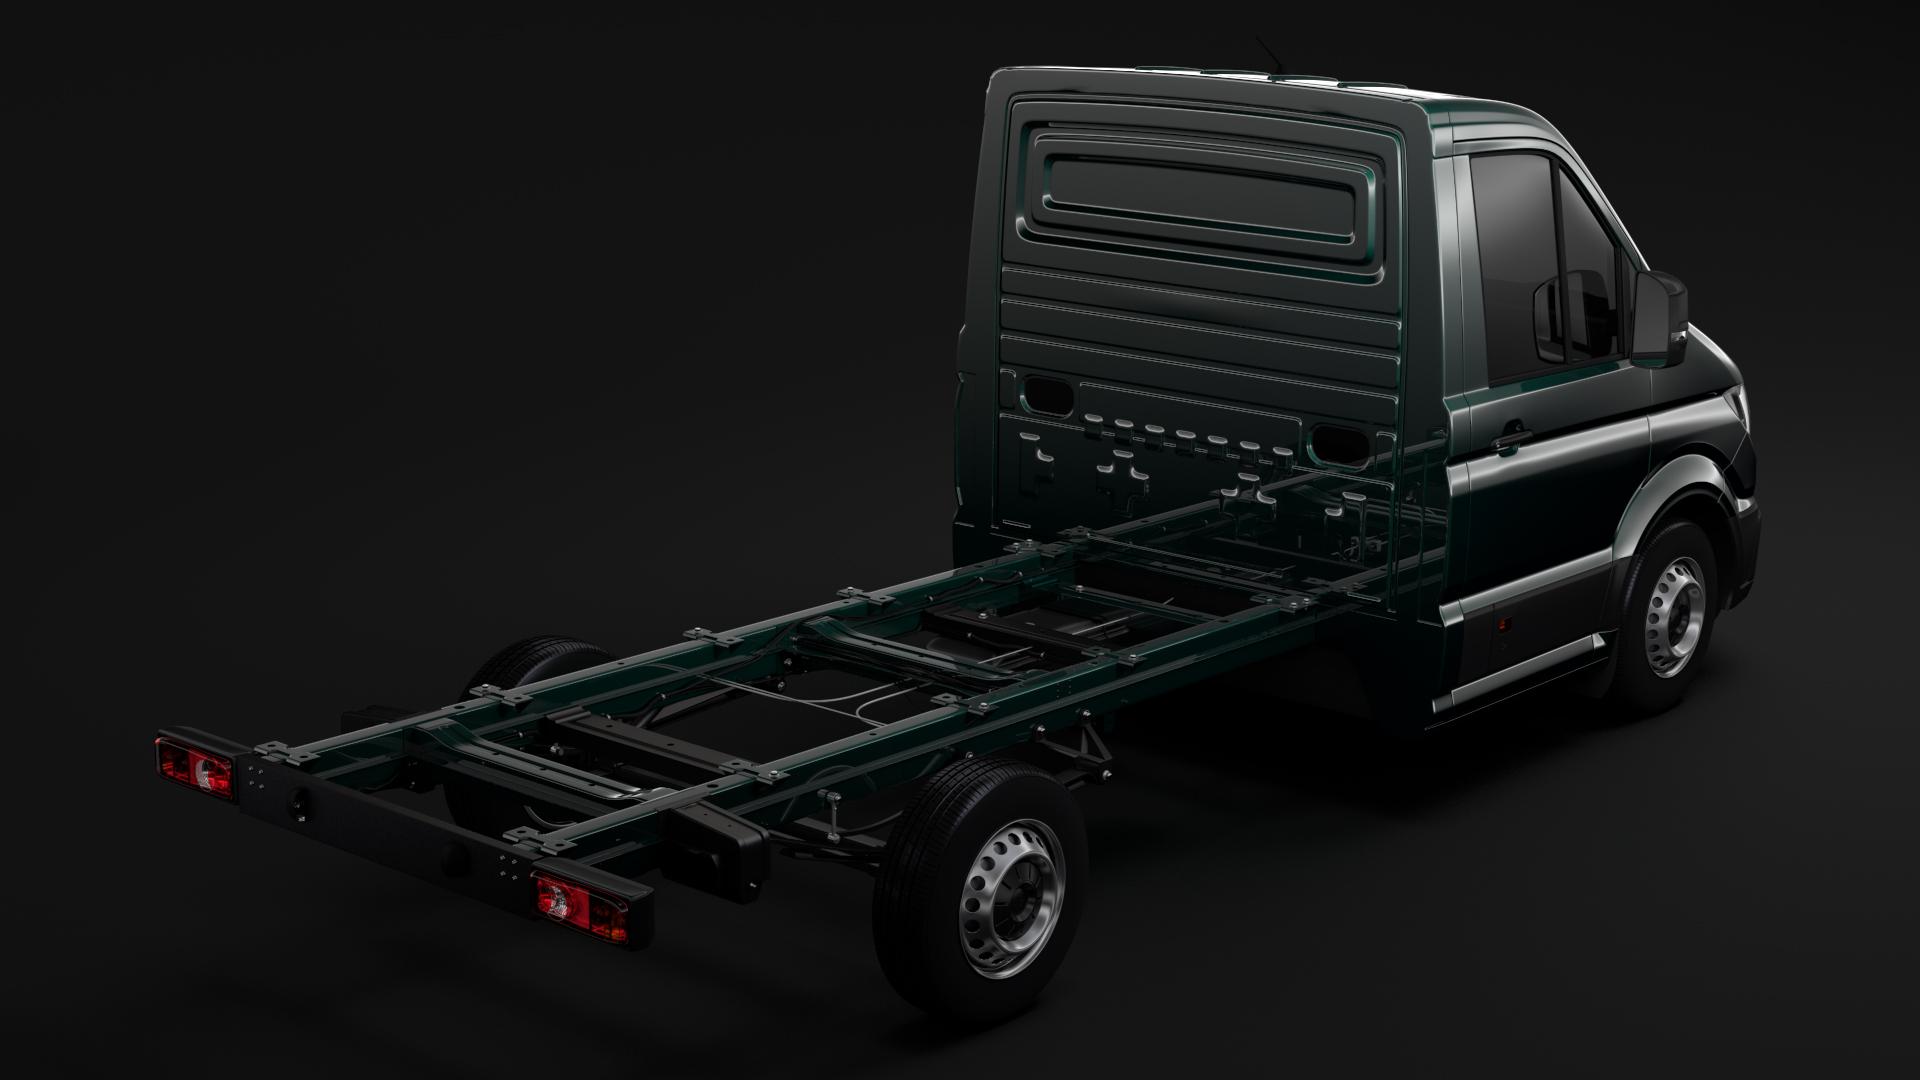 wv crafter chassis single-cab 2017 3d model max fbx c4d lwo ma mb hrc xsi obj 275098